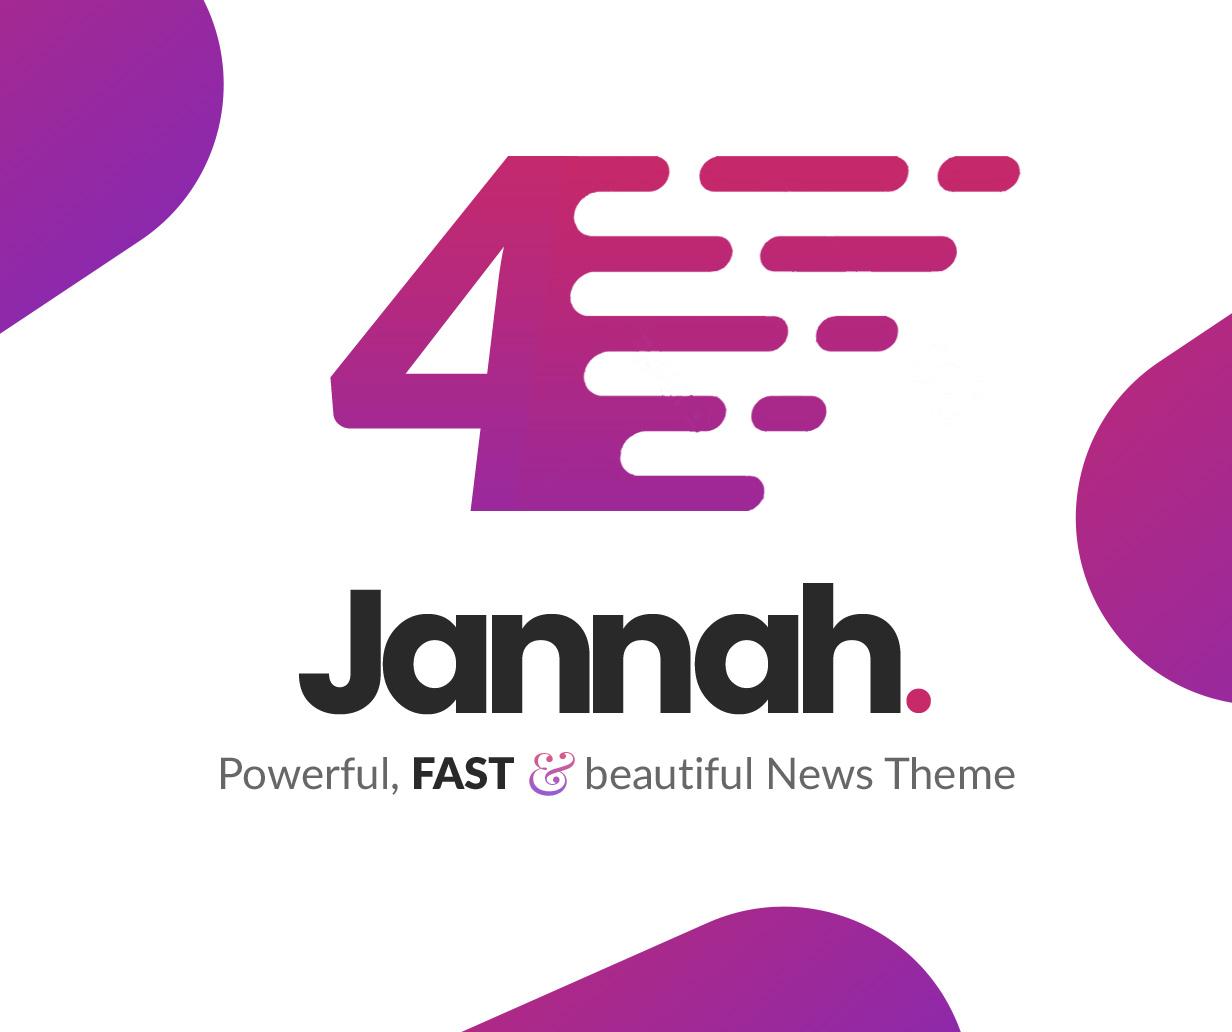 jannah 4 - Jannah - Newspaper Magazine News BuddyPress AMP